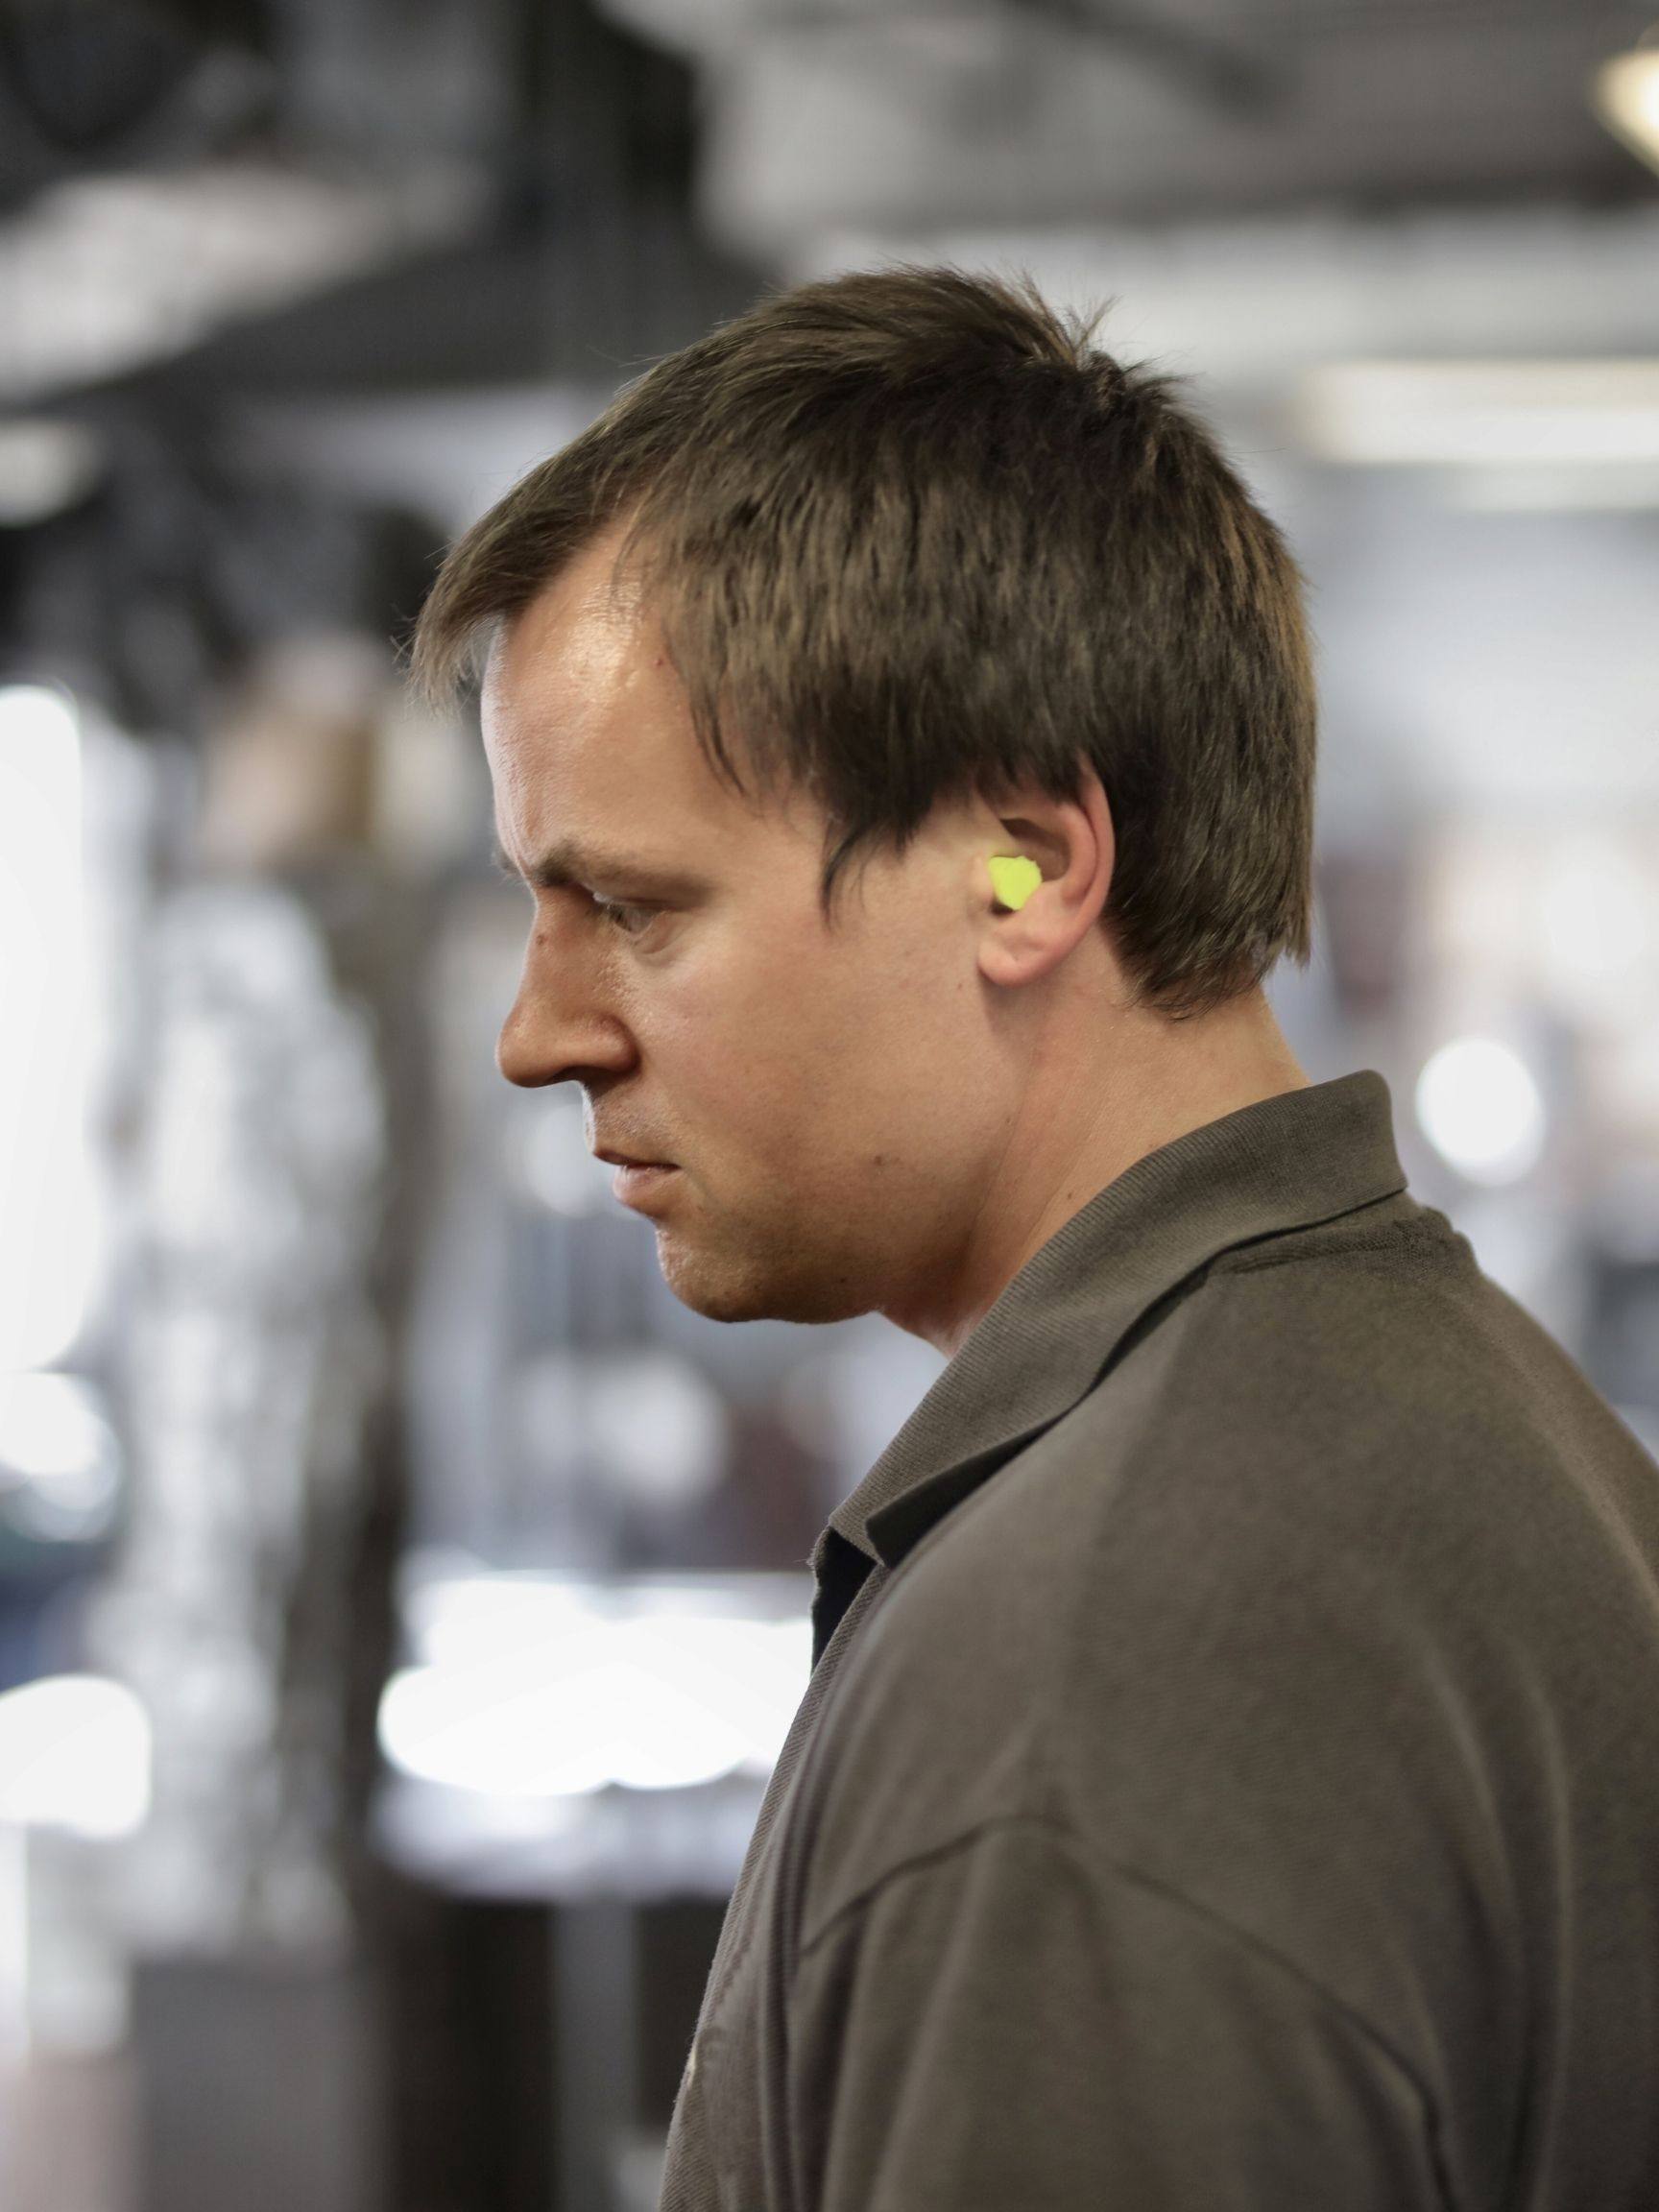 Side profile of a middle aged man wearing earplugs inside a factory.